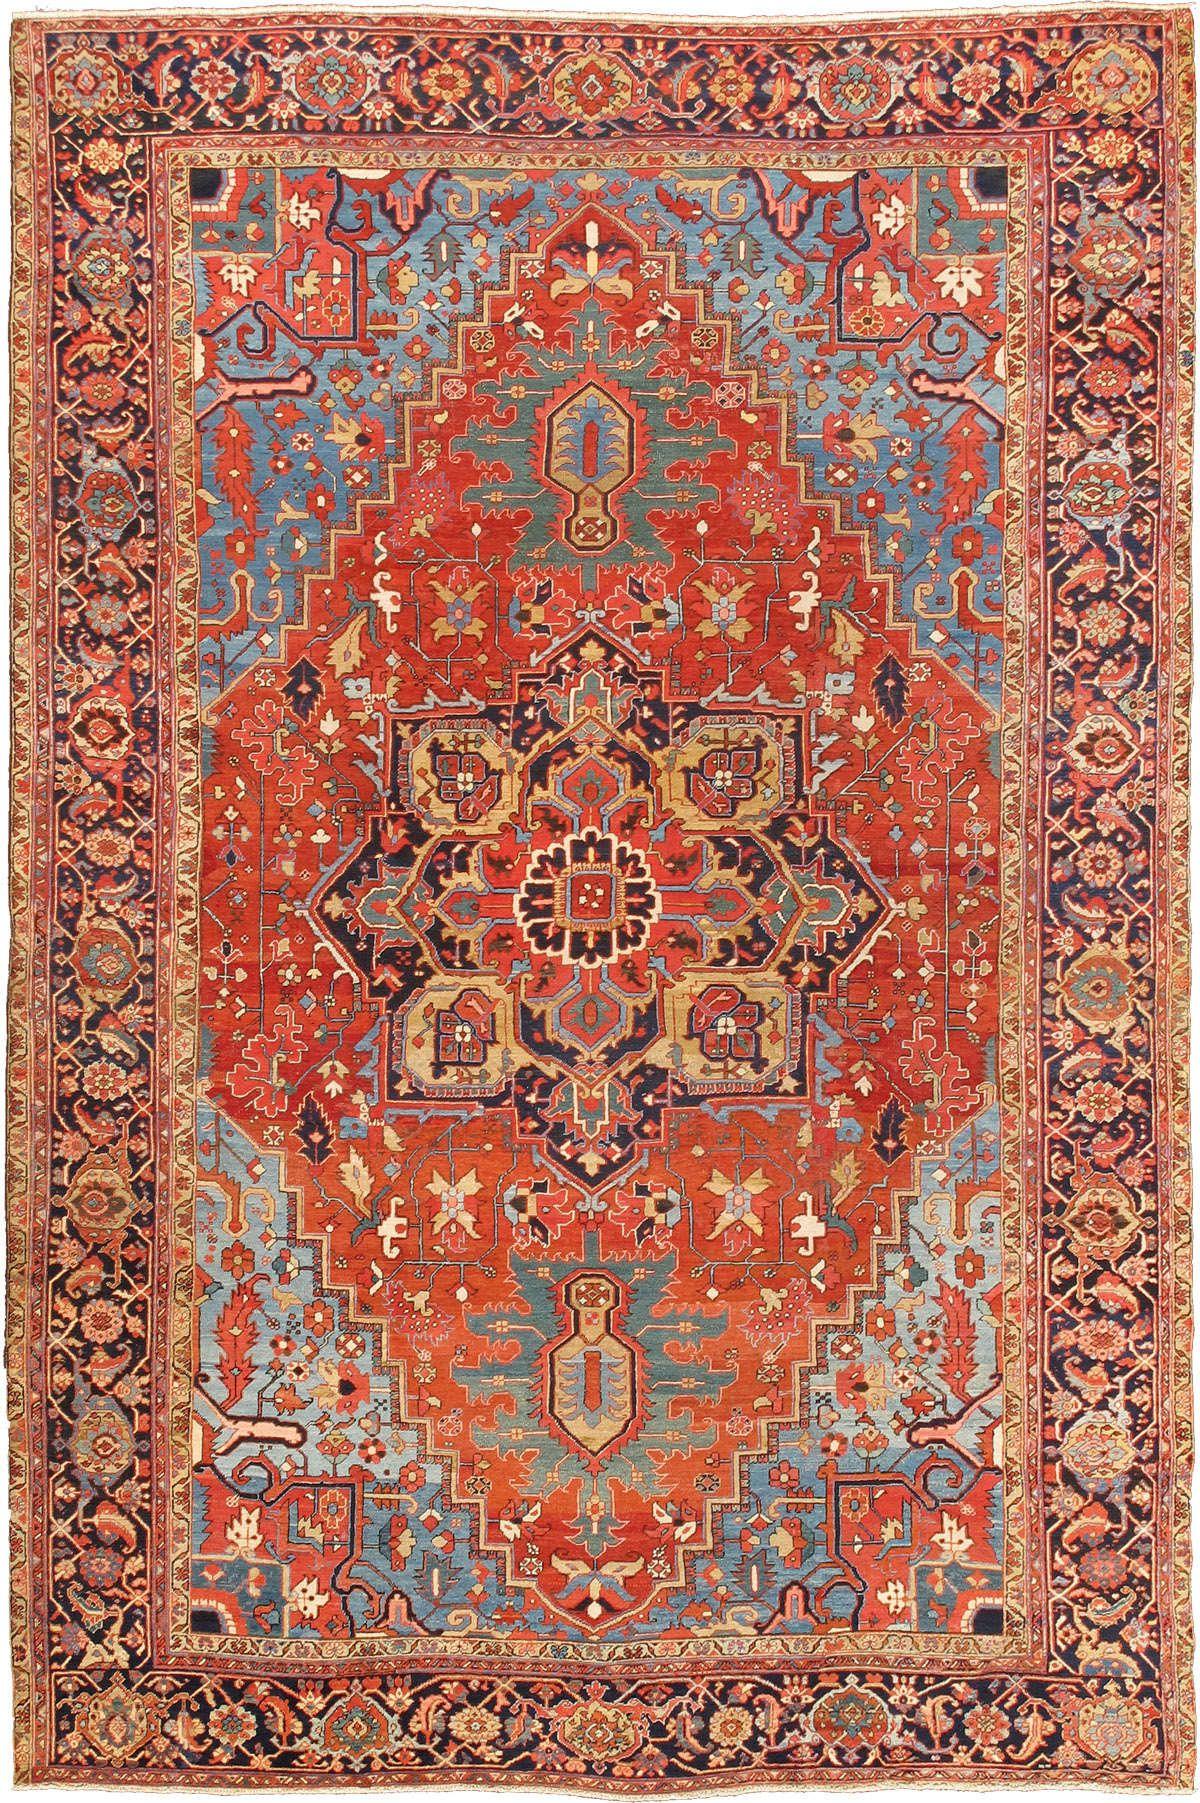 Persian Heriz Serapi Rug 10 6 X15 2 1920 Keivan Woven Arts Gallery Wolle Kaufen